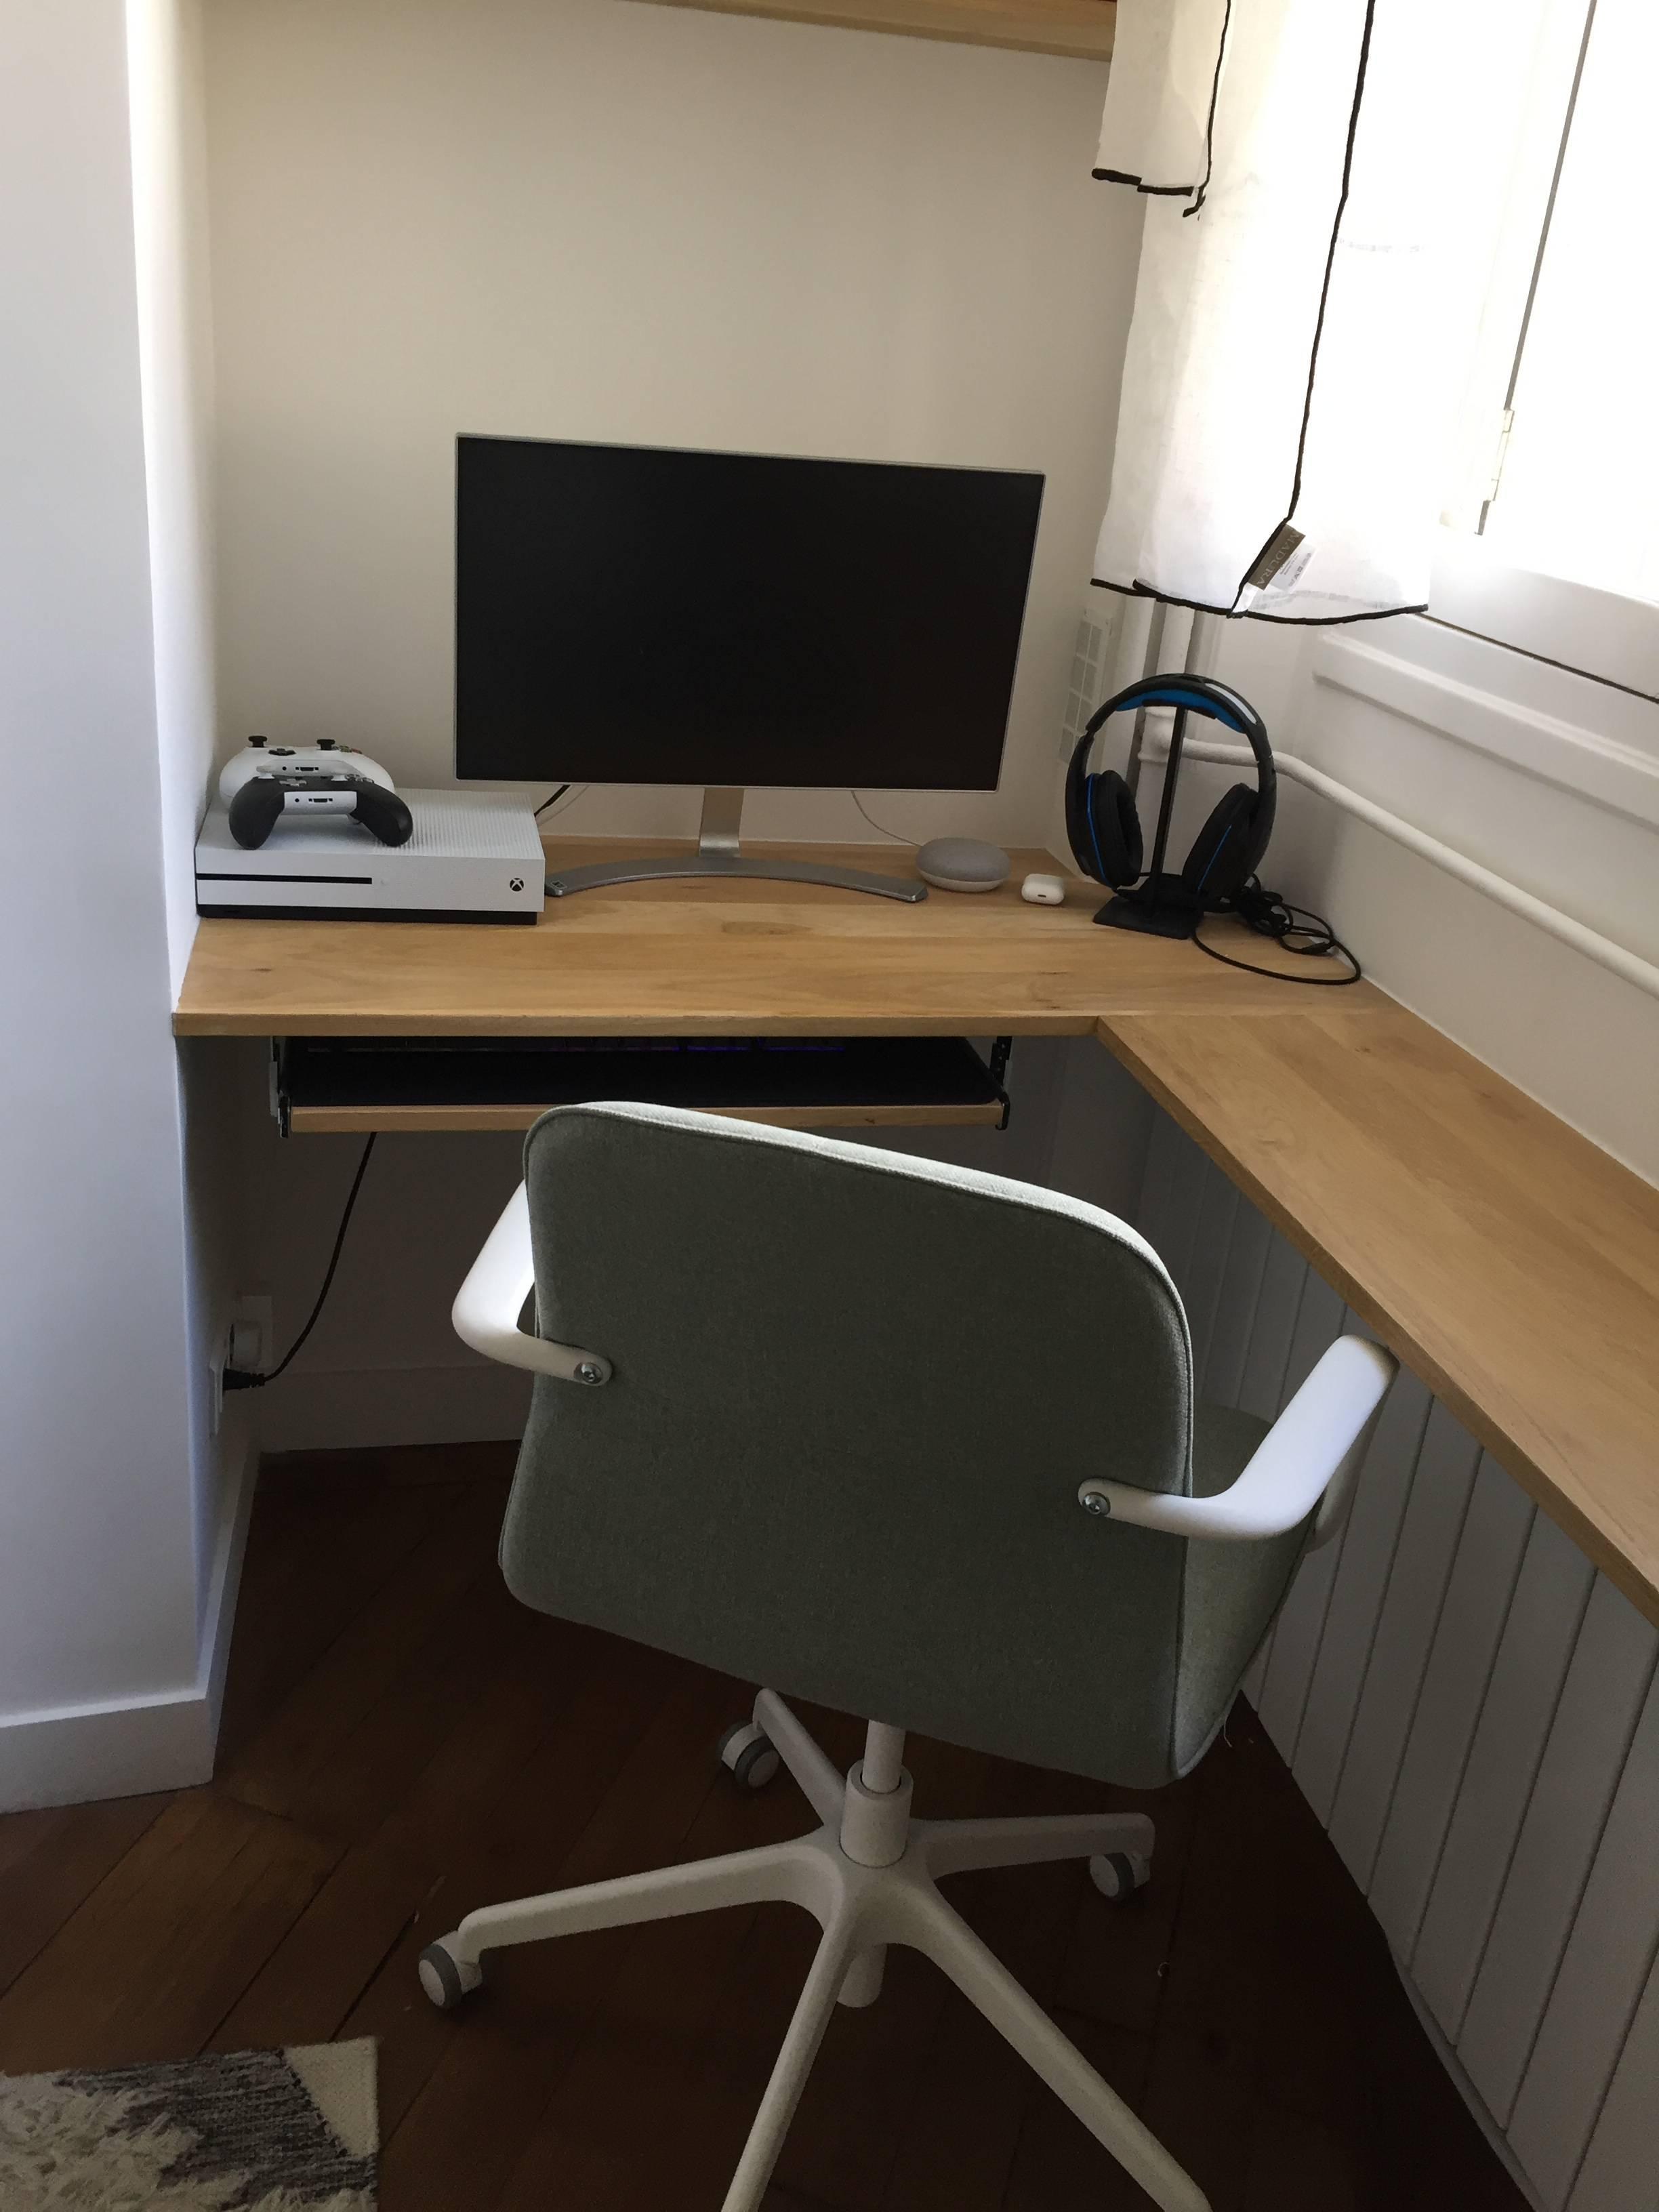 Maxime's Setup - Console gaming setup | Scooget